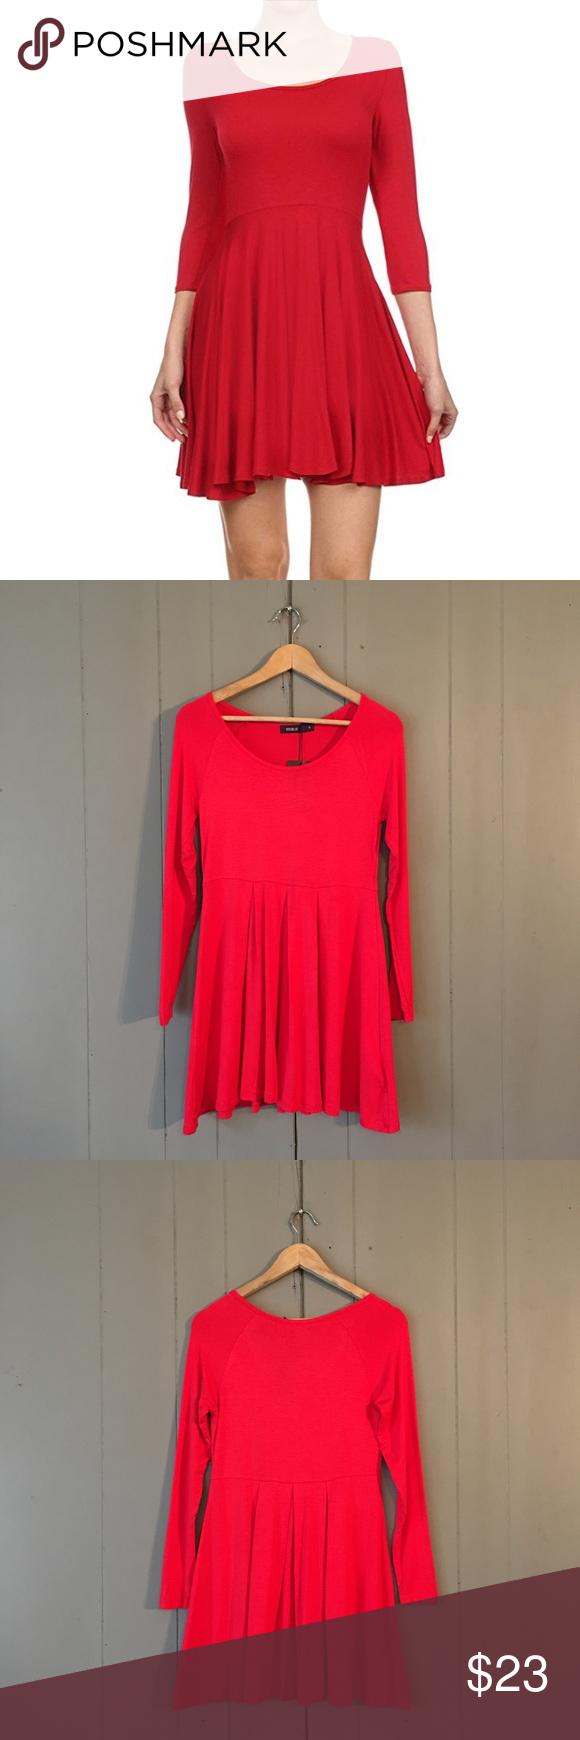 red sleeve fit u flare dress dress brands fit flare dress